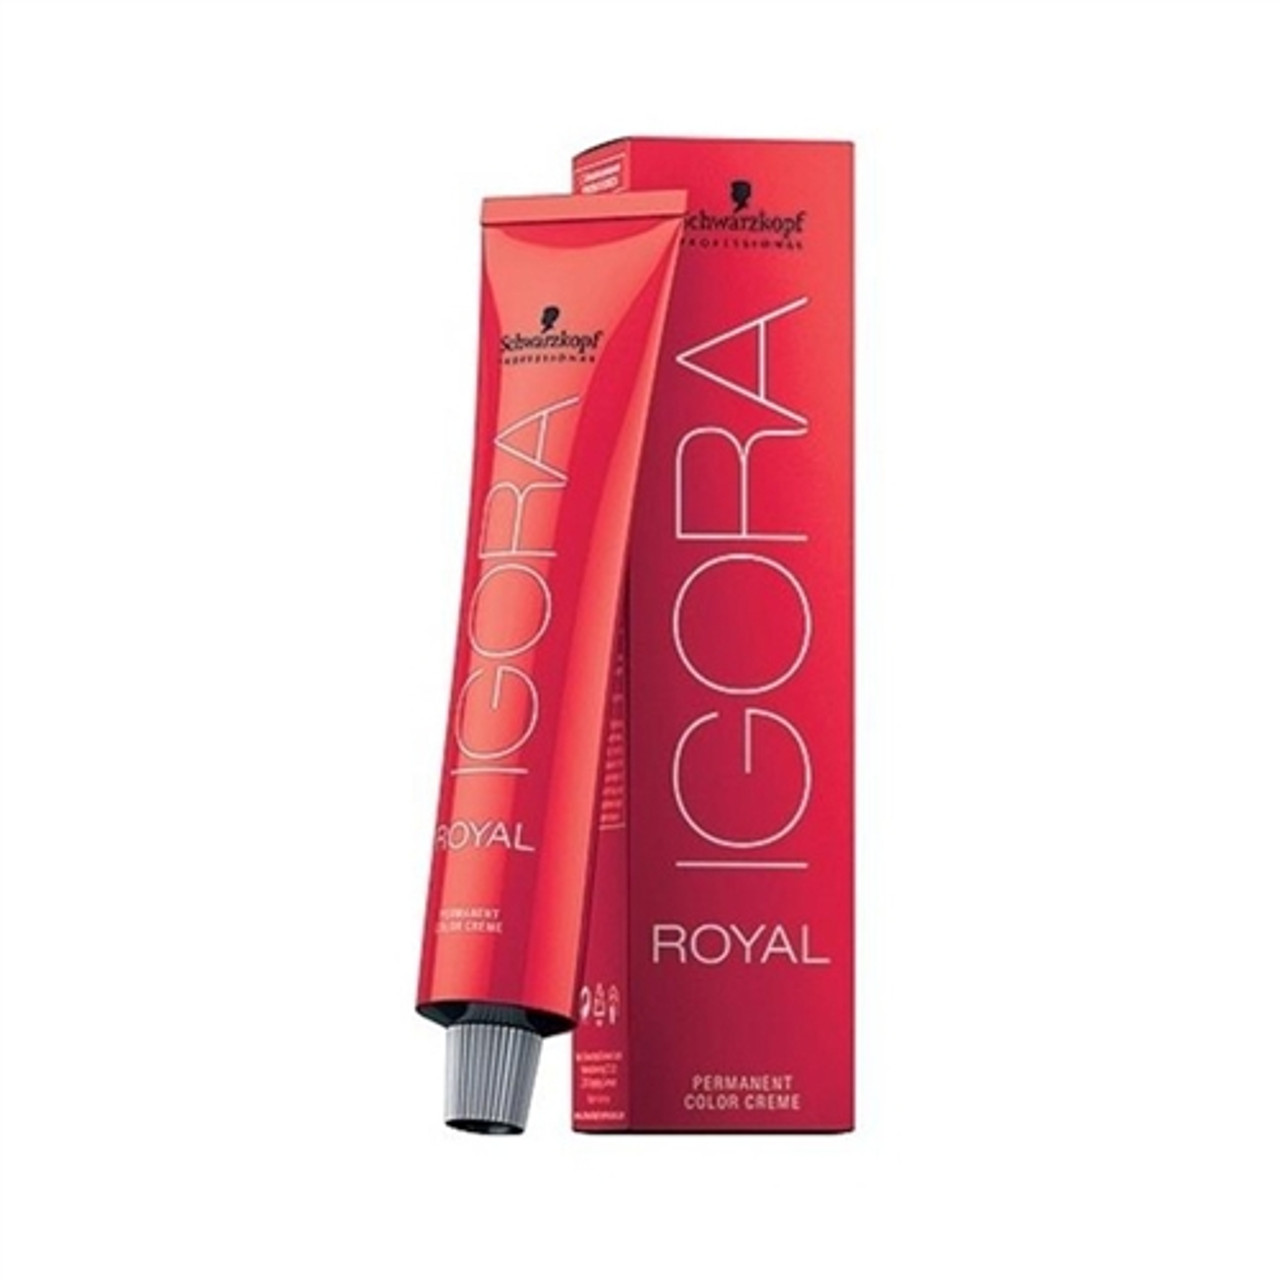 Schwarzkopf Igora Royal Permanent Color Creme - Light Brown 6-0